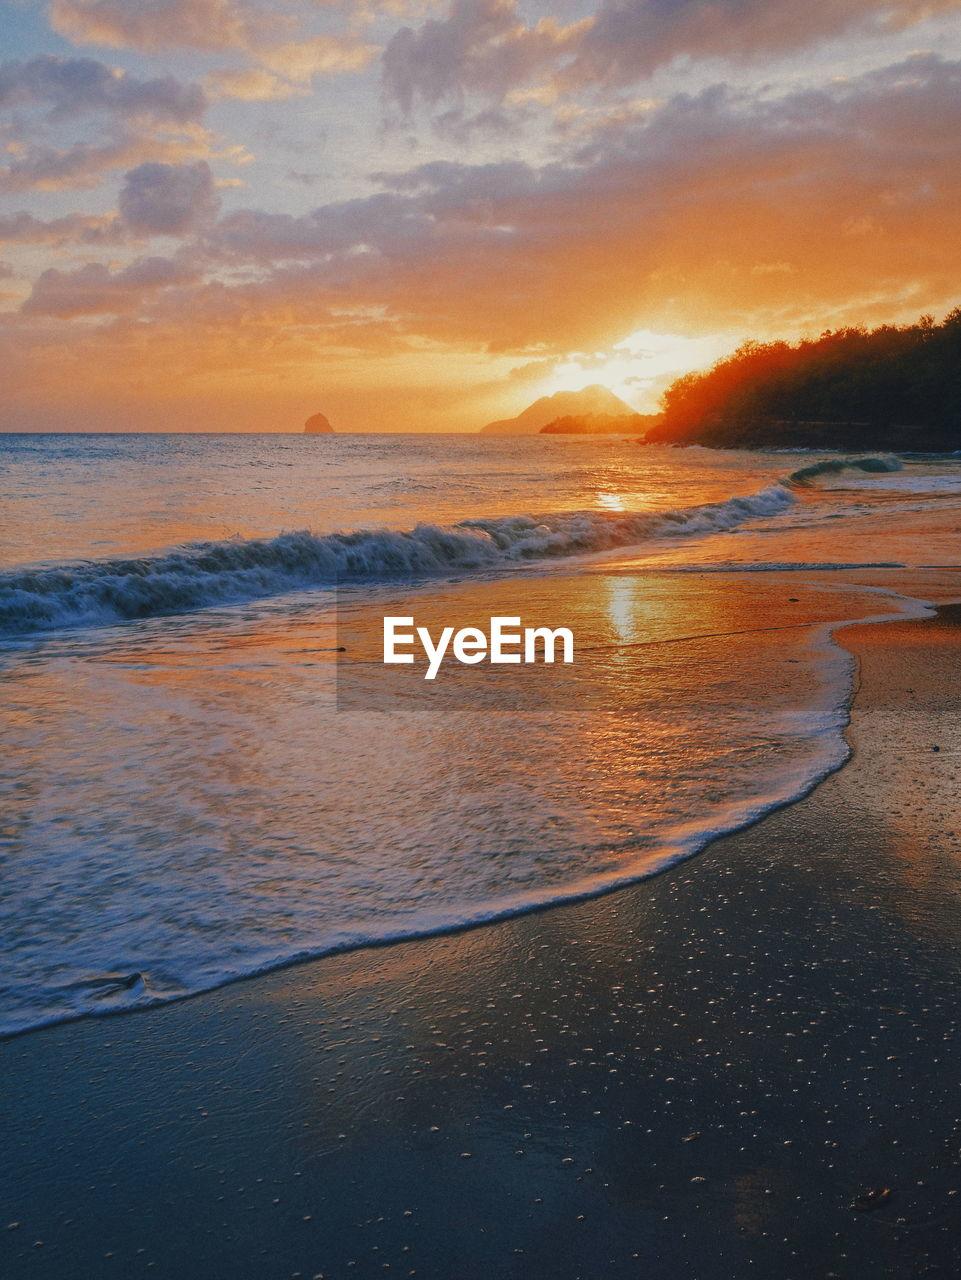 sky, water, sunset, sea, beach, land, beauty in nature, scenics - nature, cloud - sky, horizon over water, horizon, nature, tranquil scene, tranquility, wave, motion, orange color, idyllic, sport, no people, outdoors